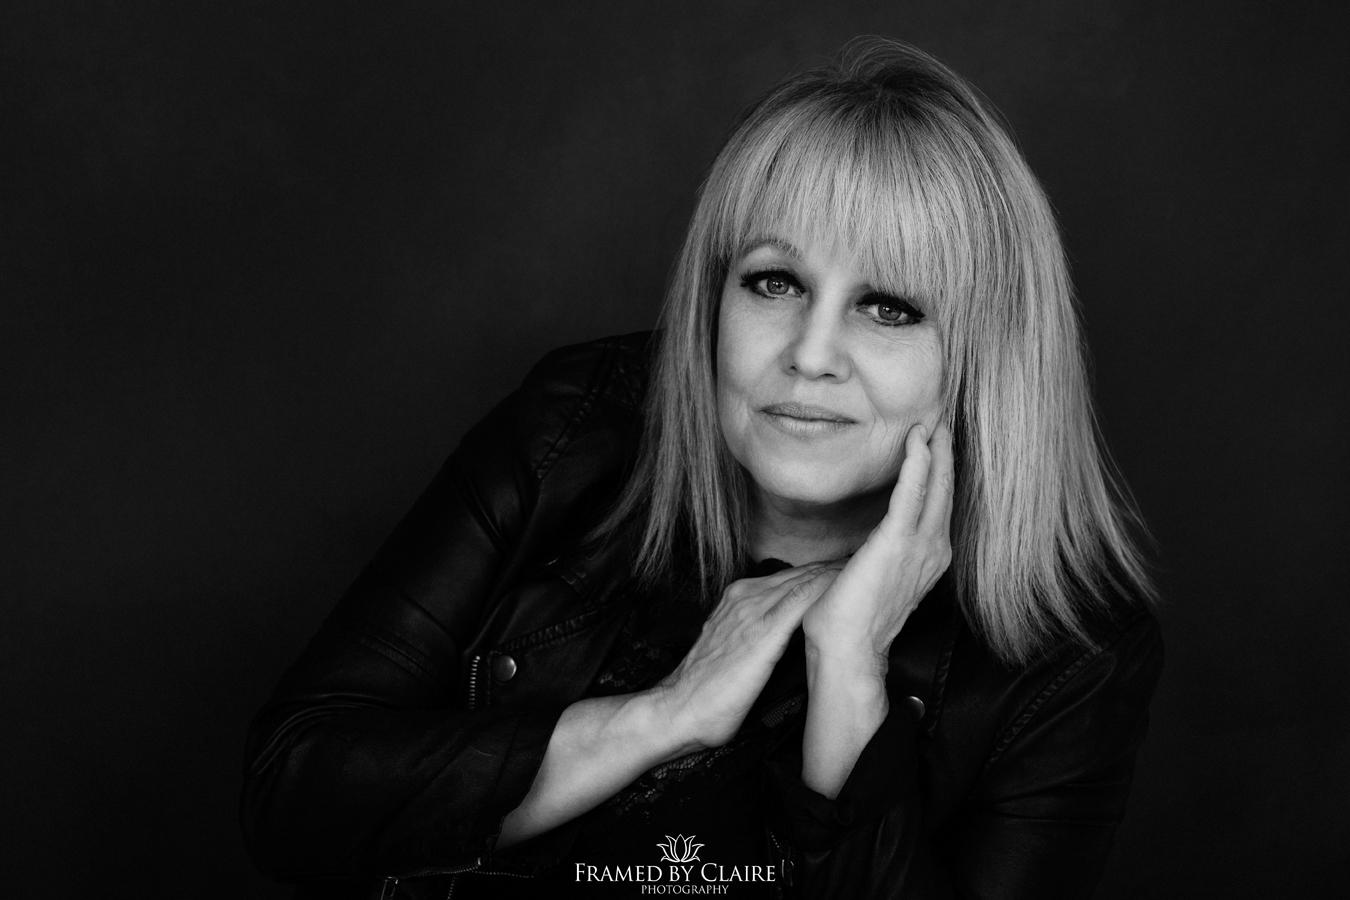 Hair stylist personal branding portraits